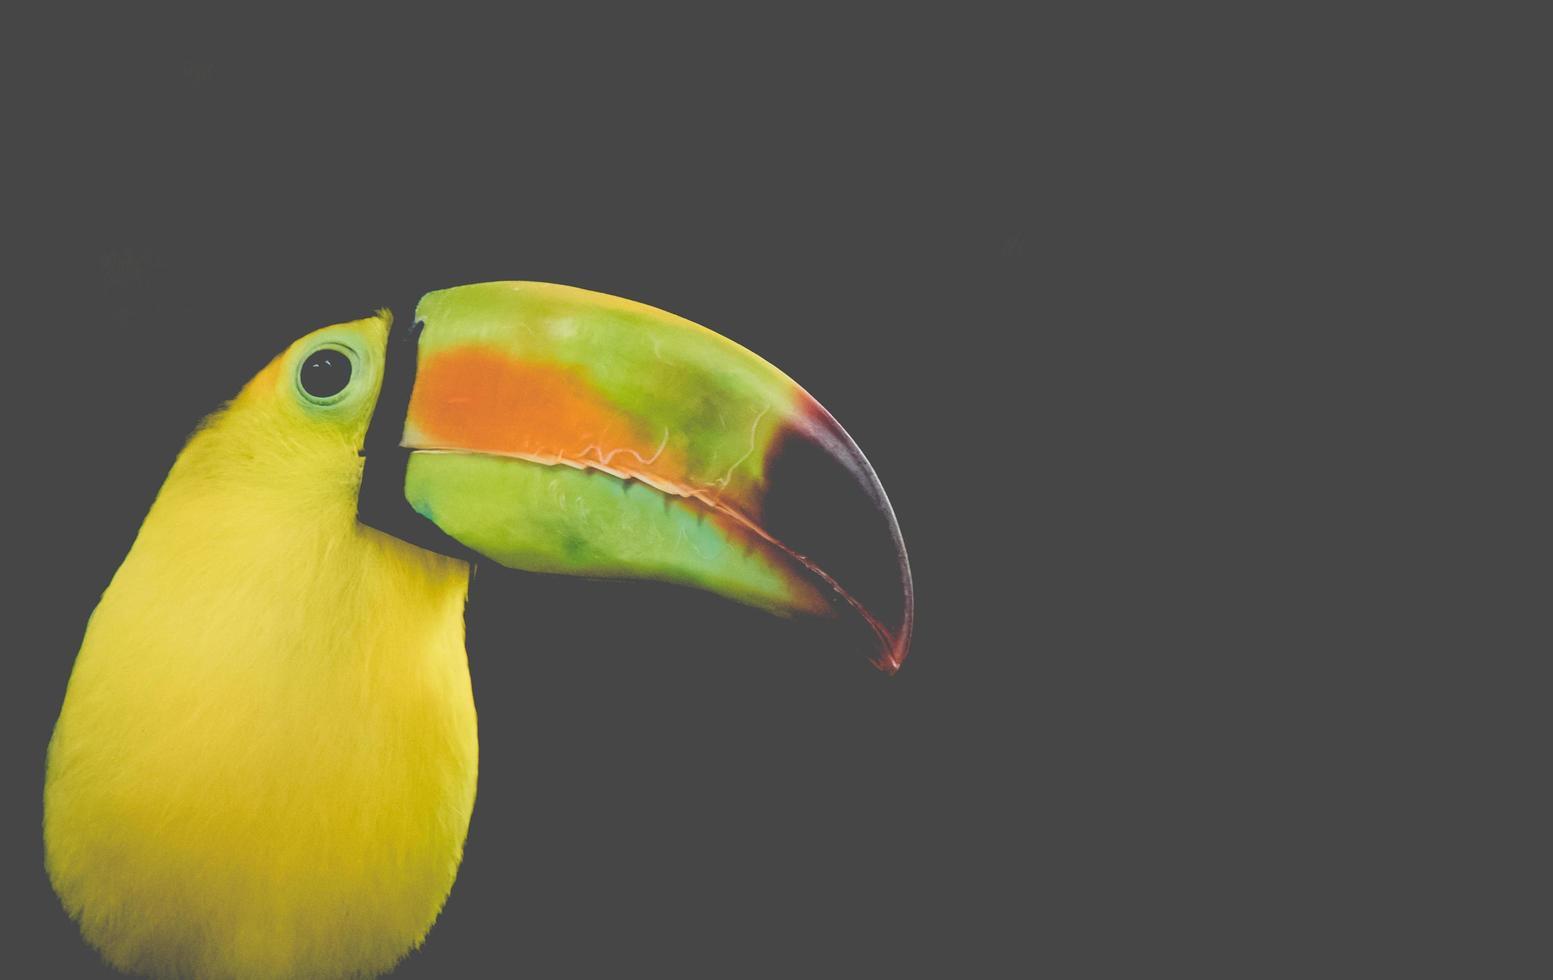 Toucan bird side profile photo